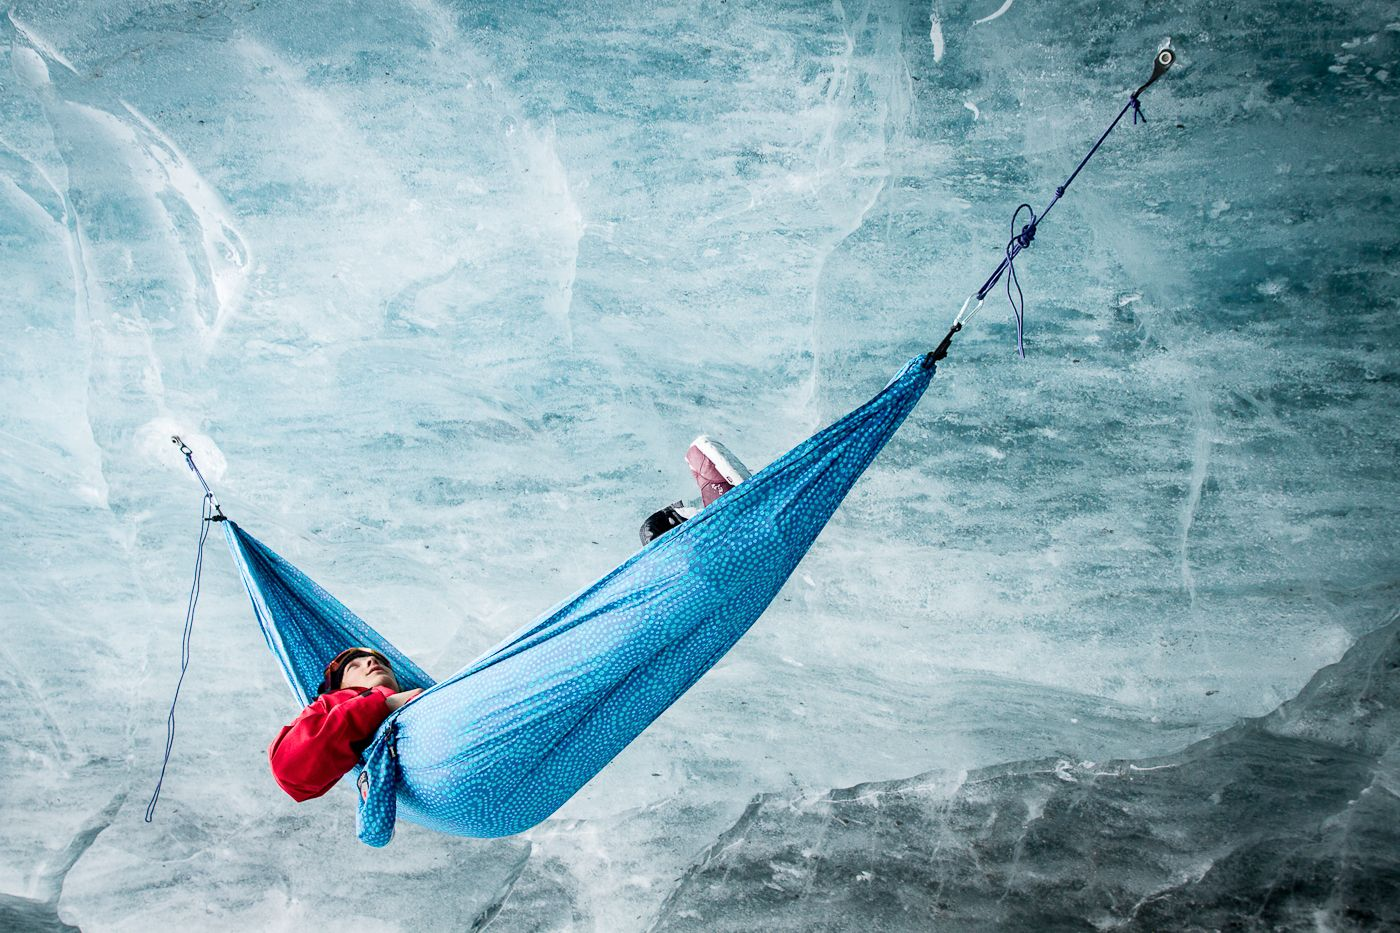 double parachute nylon hammock double parachute nylon hammock   parachutes and camping stuff  rh   pinterest